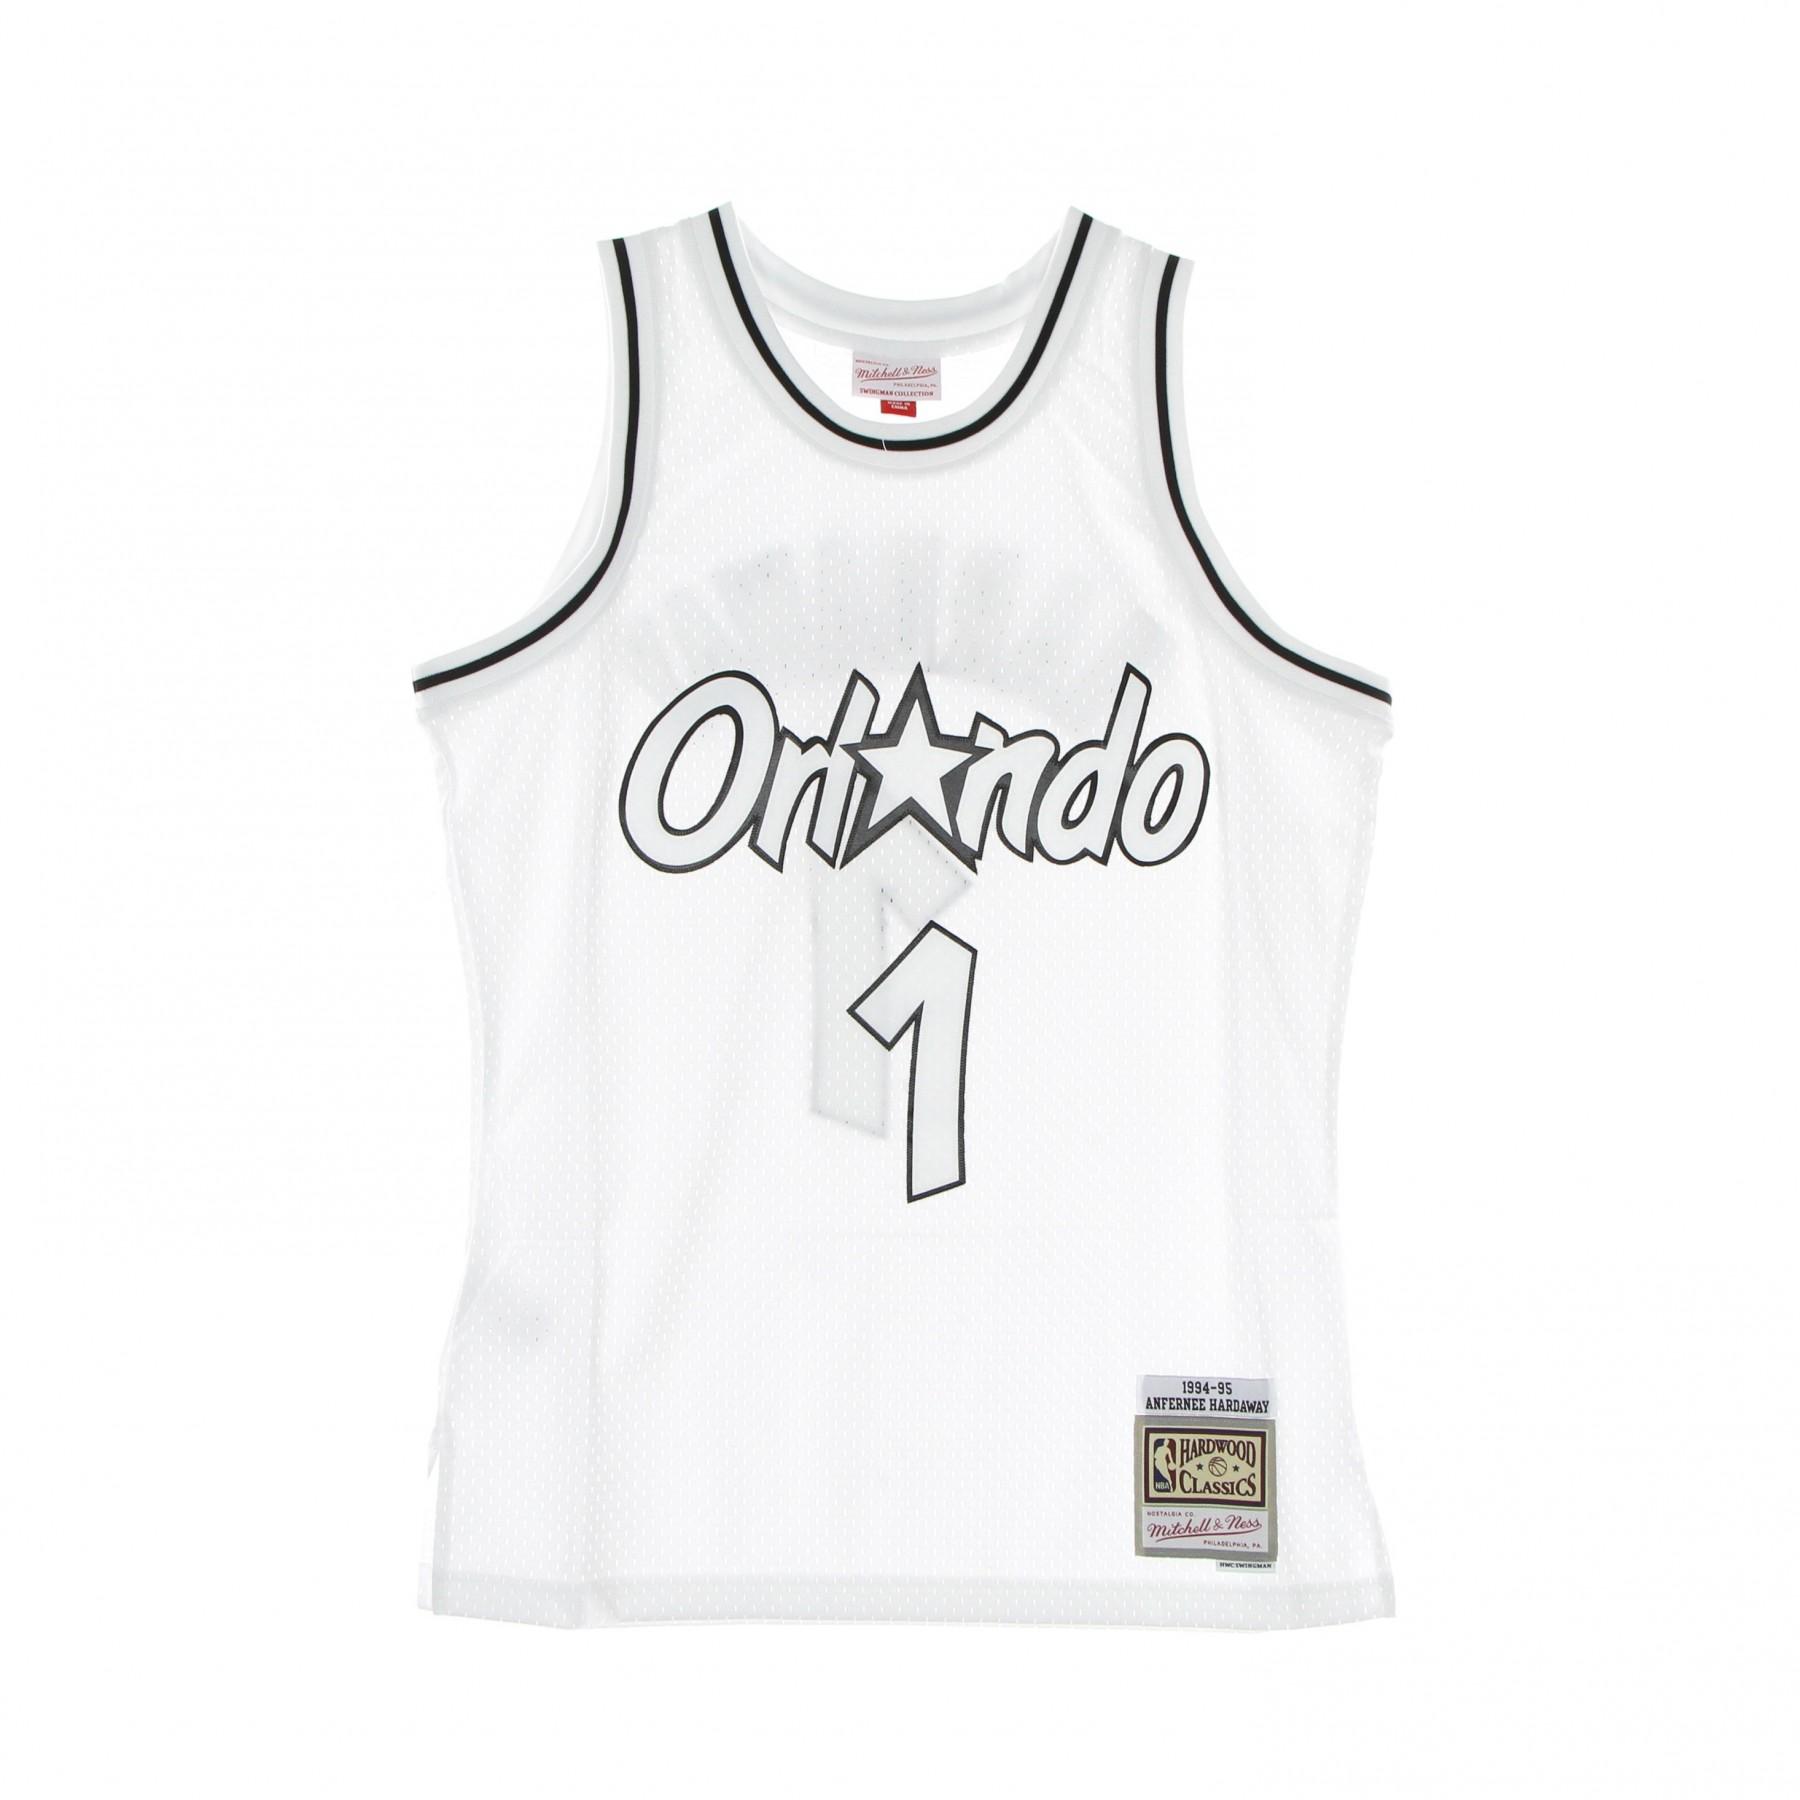 canotta basket uomo nba white black swingman jersey hardwood classics no 1 penny hardaway 1994-95 orlmag XL